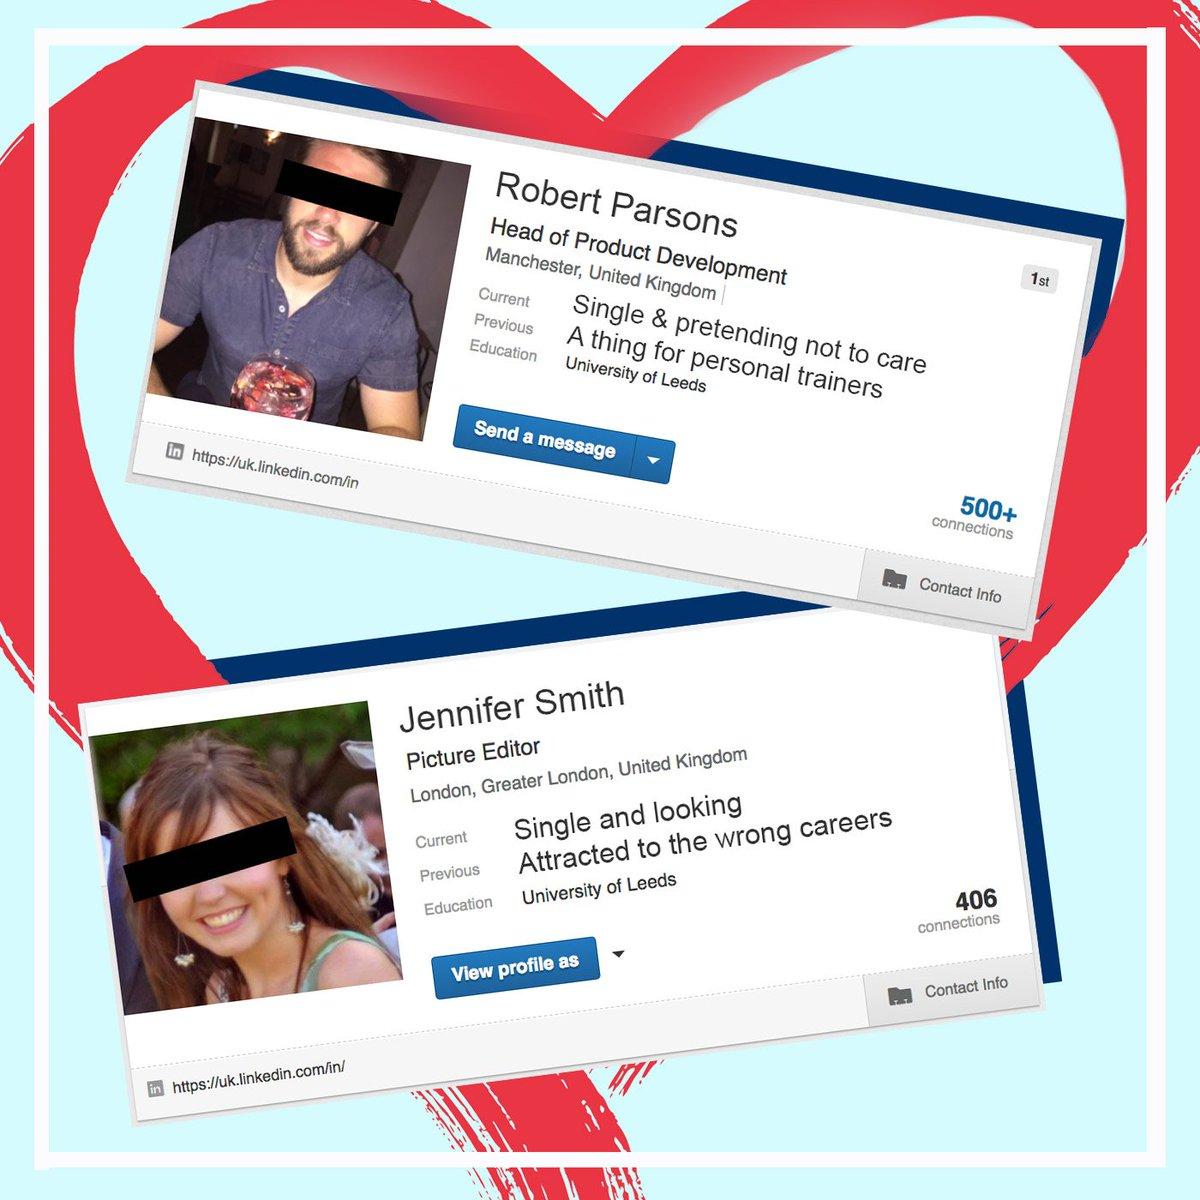 Online dating maa singleä